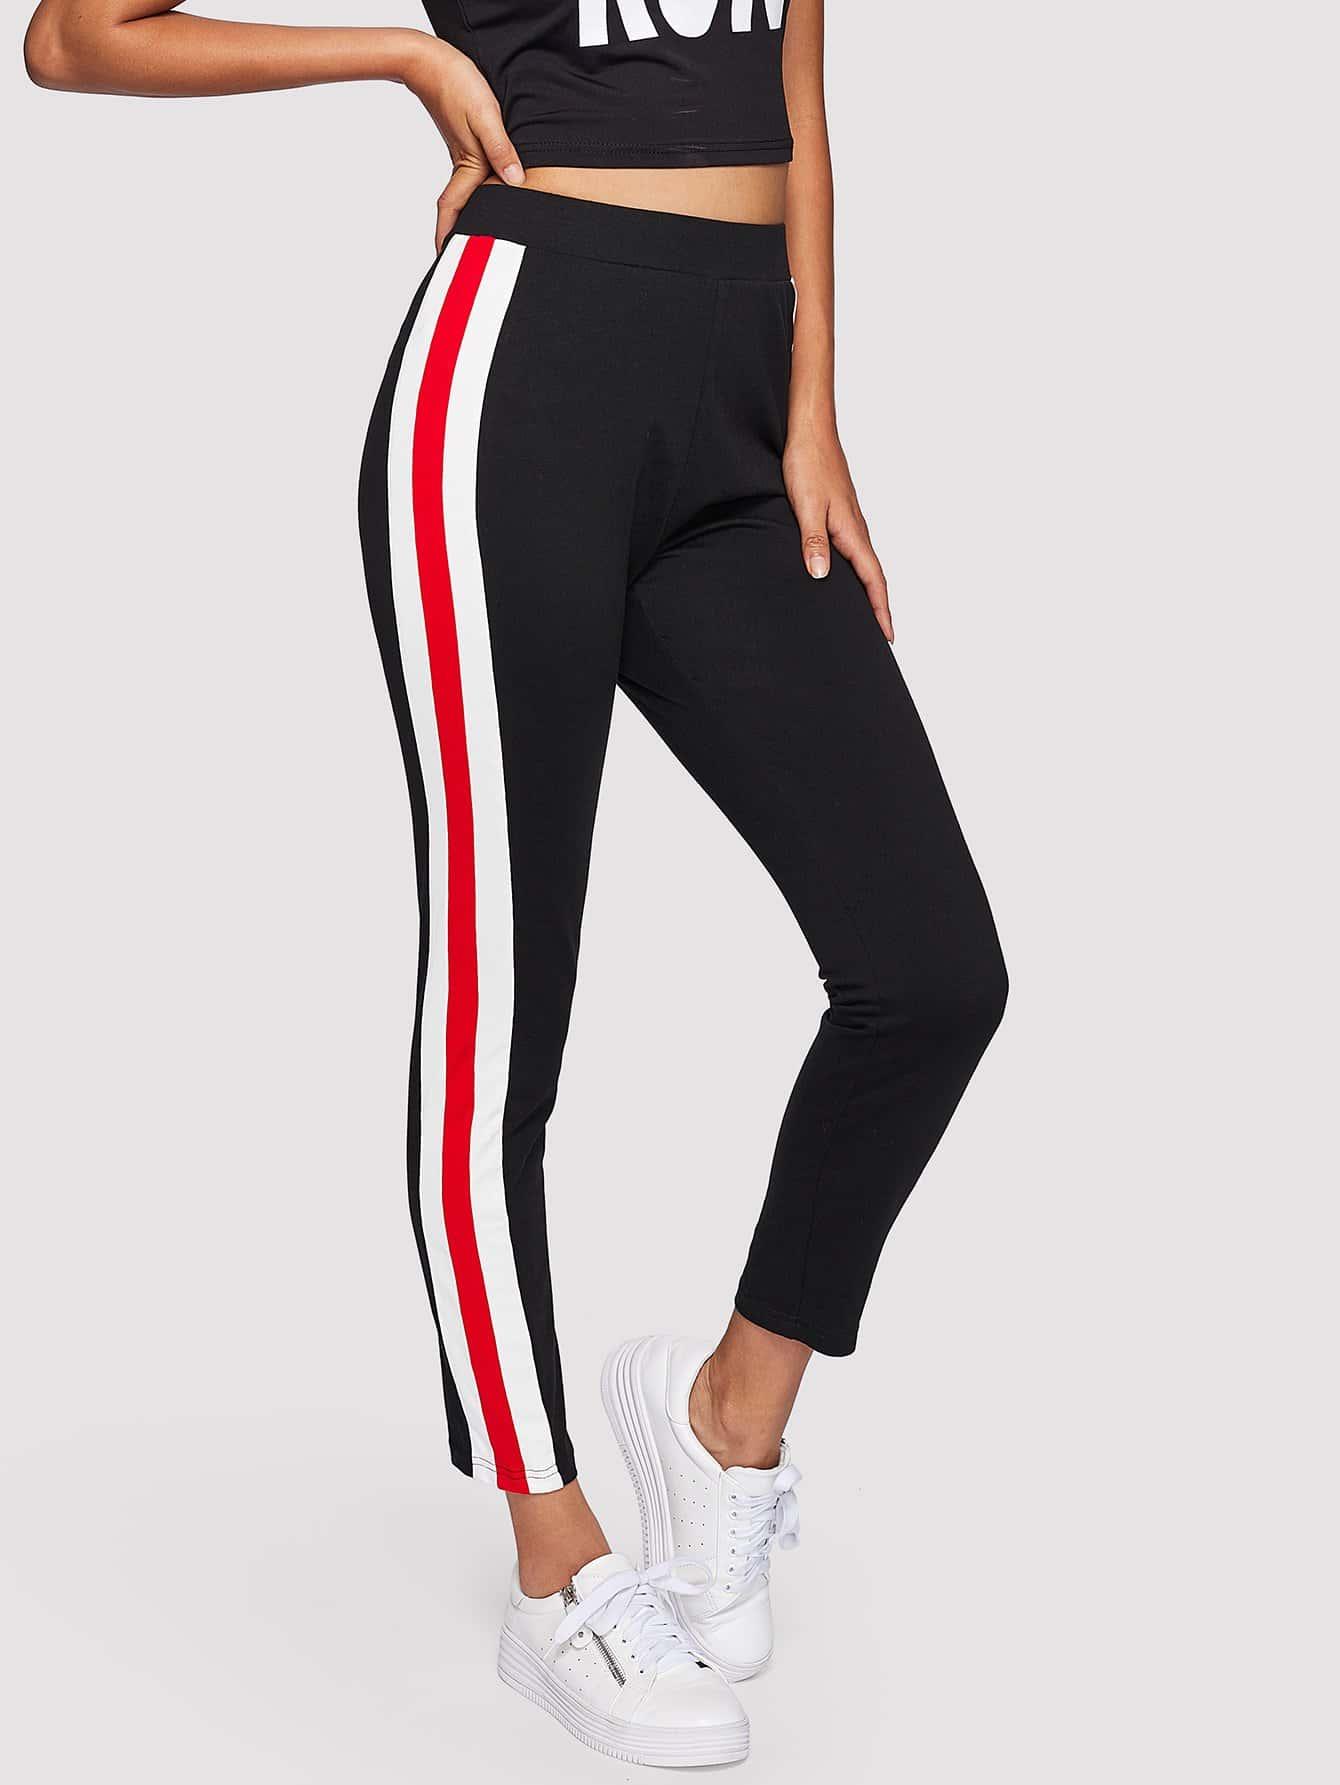 Color Block Side Skinny Leggings high waist color block skinny sports leggings